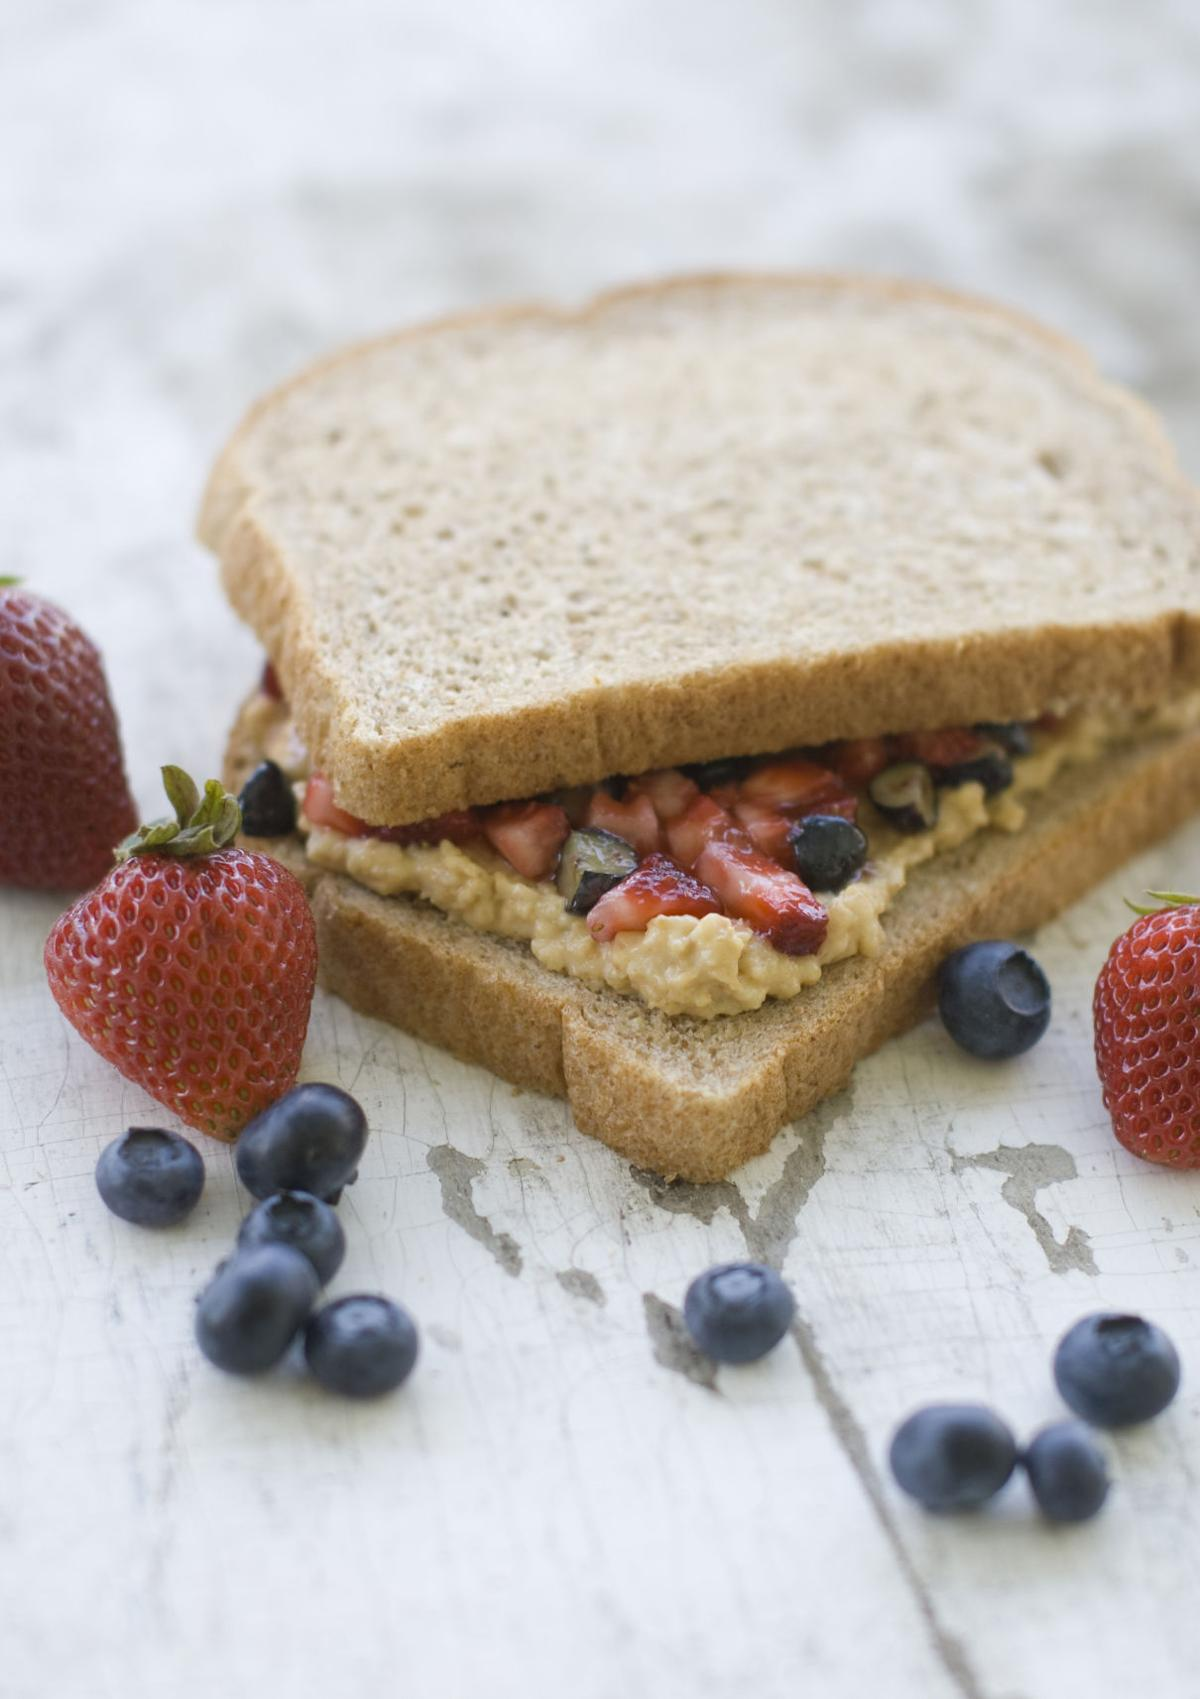 Popular PB&J sandwich gets a healthy makeover